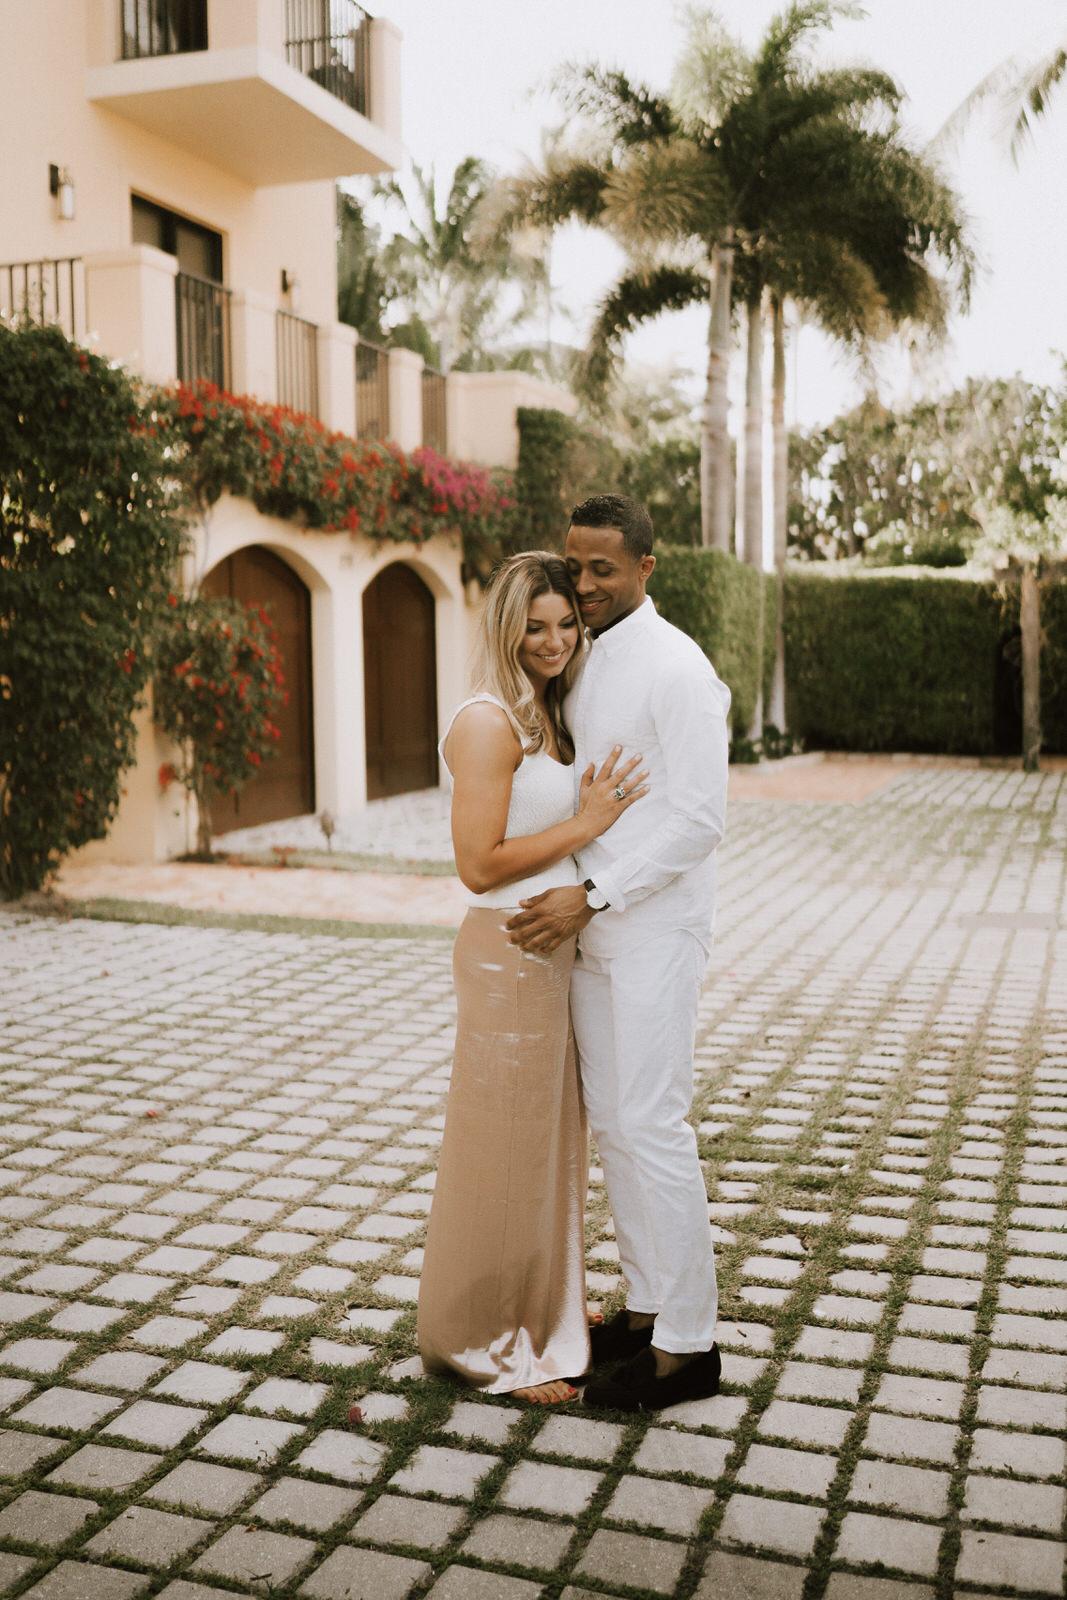 Naples 5th Ave Engagement Photos- Michelle Gonzalez Photography- Michele + Troy-6.JPG